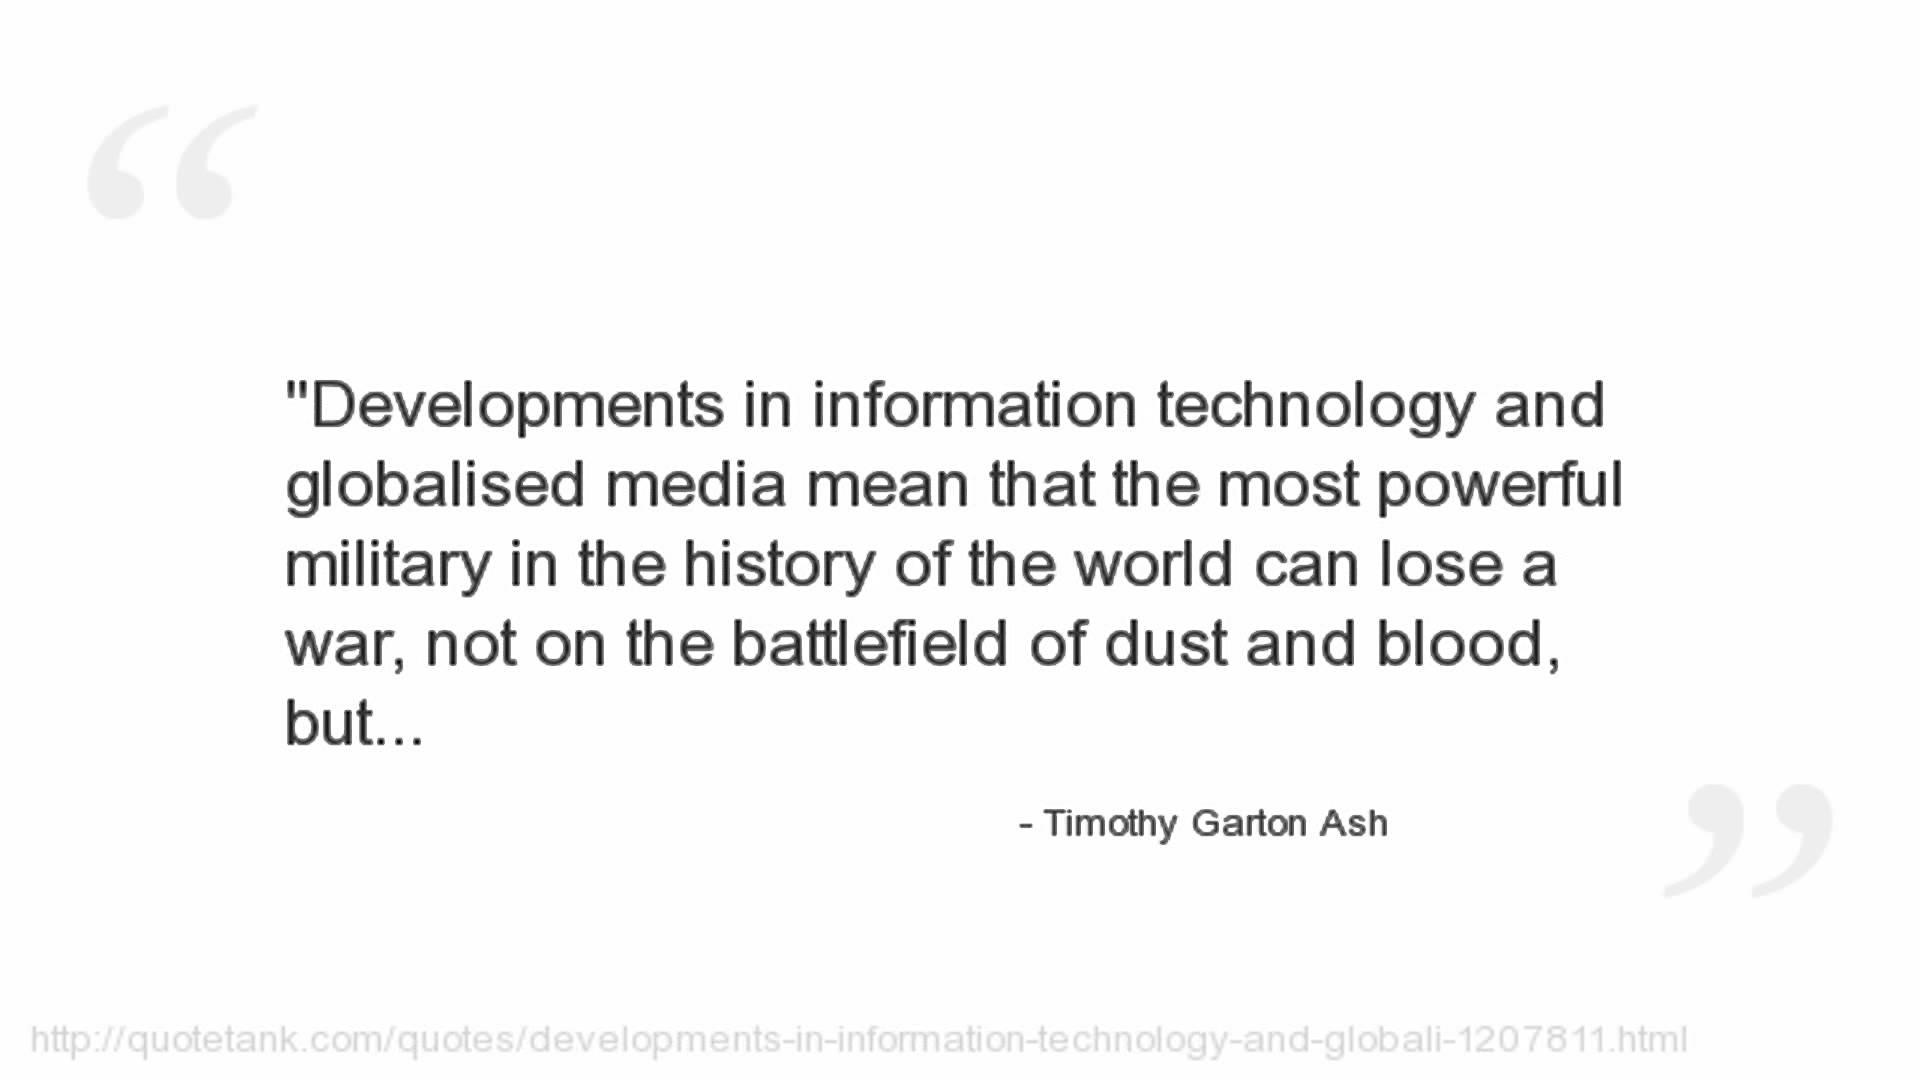 Timothy Garton Ash's quote #2